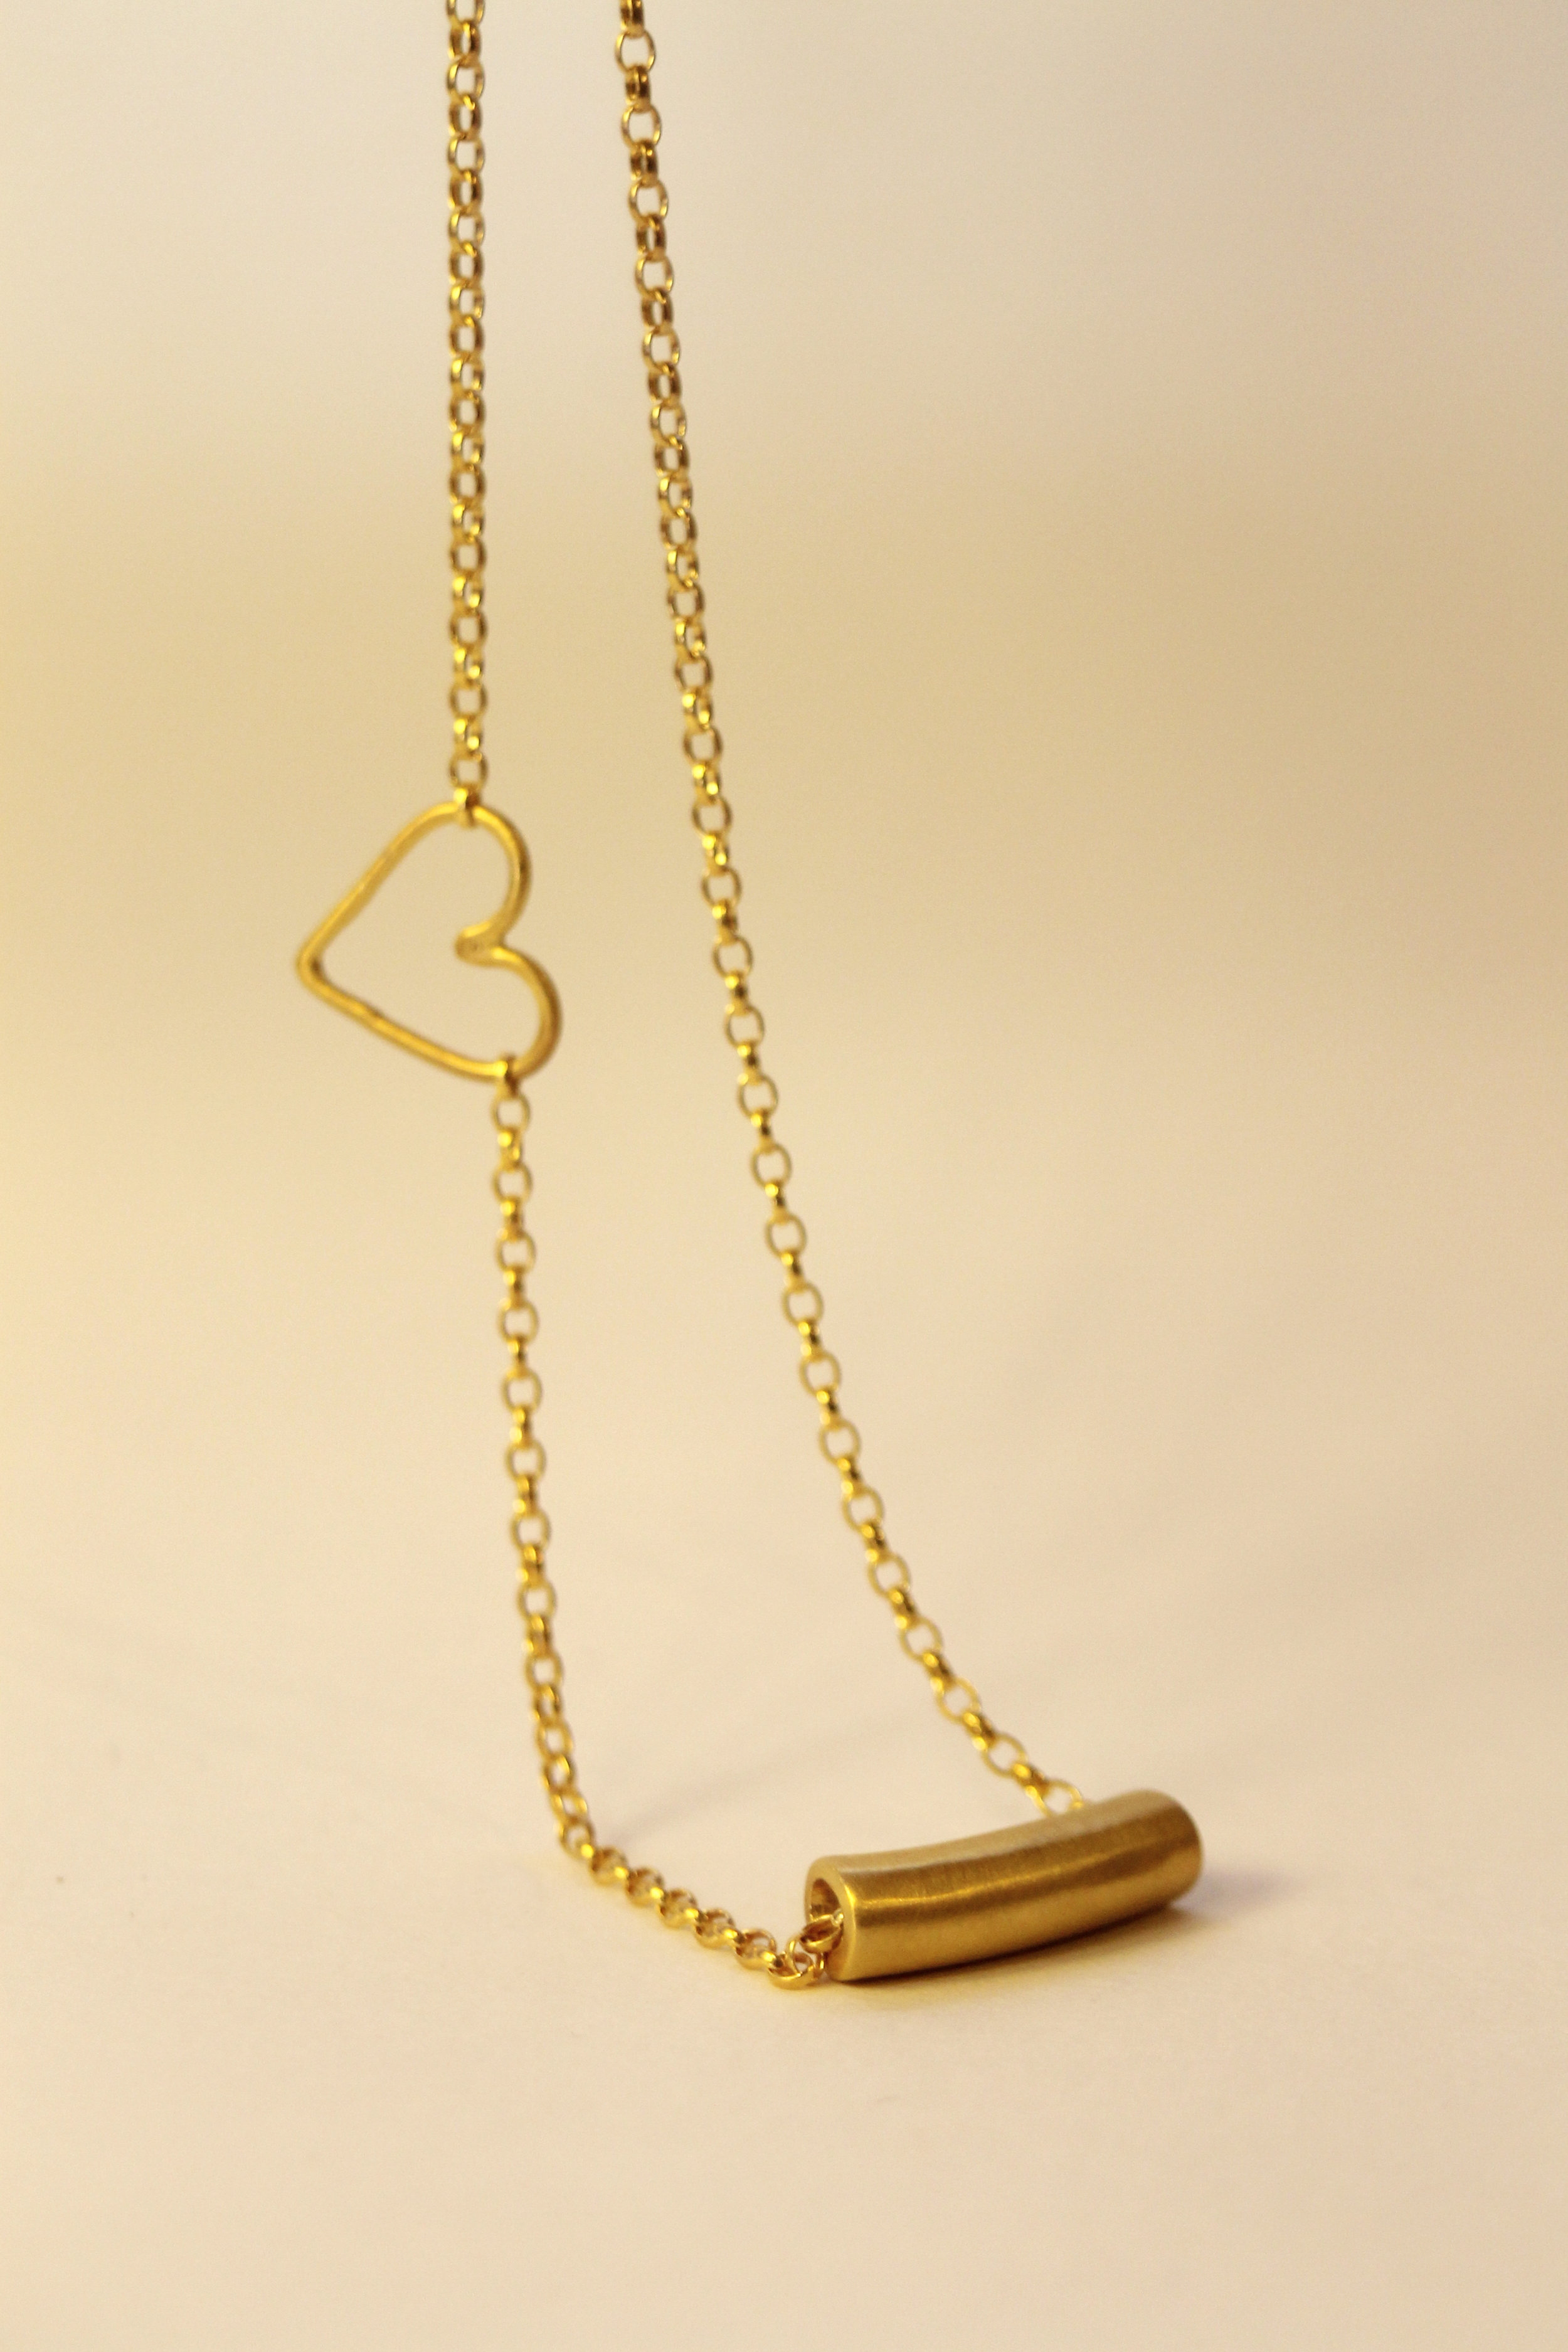 17.Mac n Heart - for Drew Barrymore 01.jpg